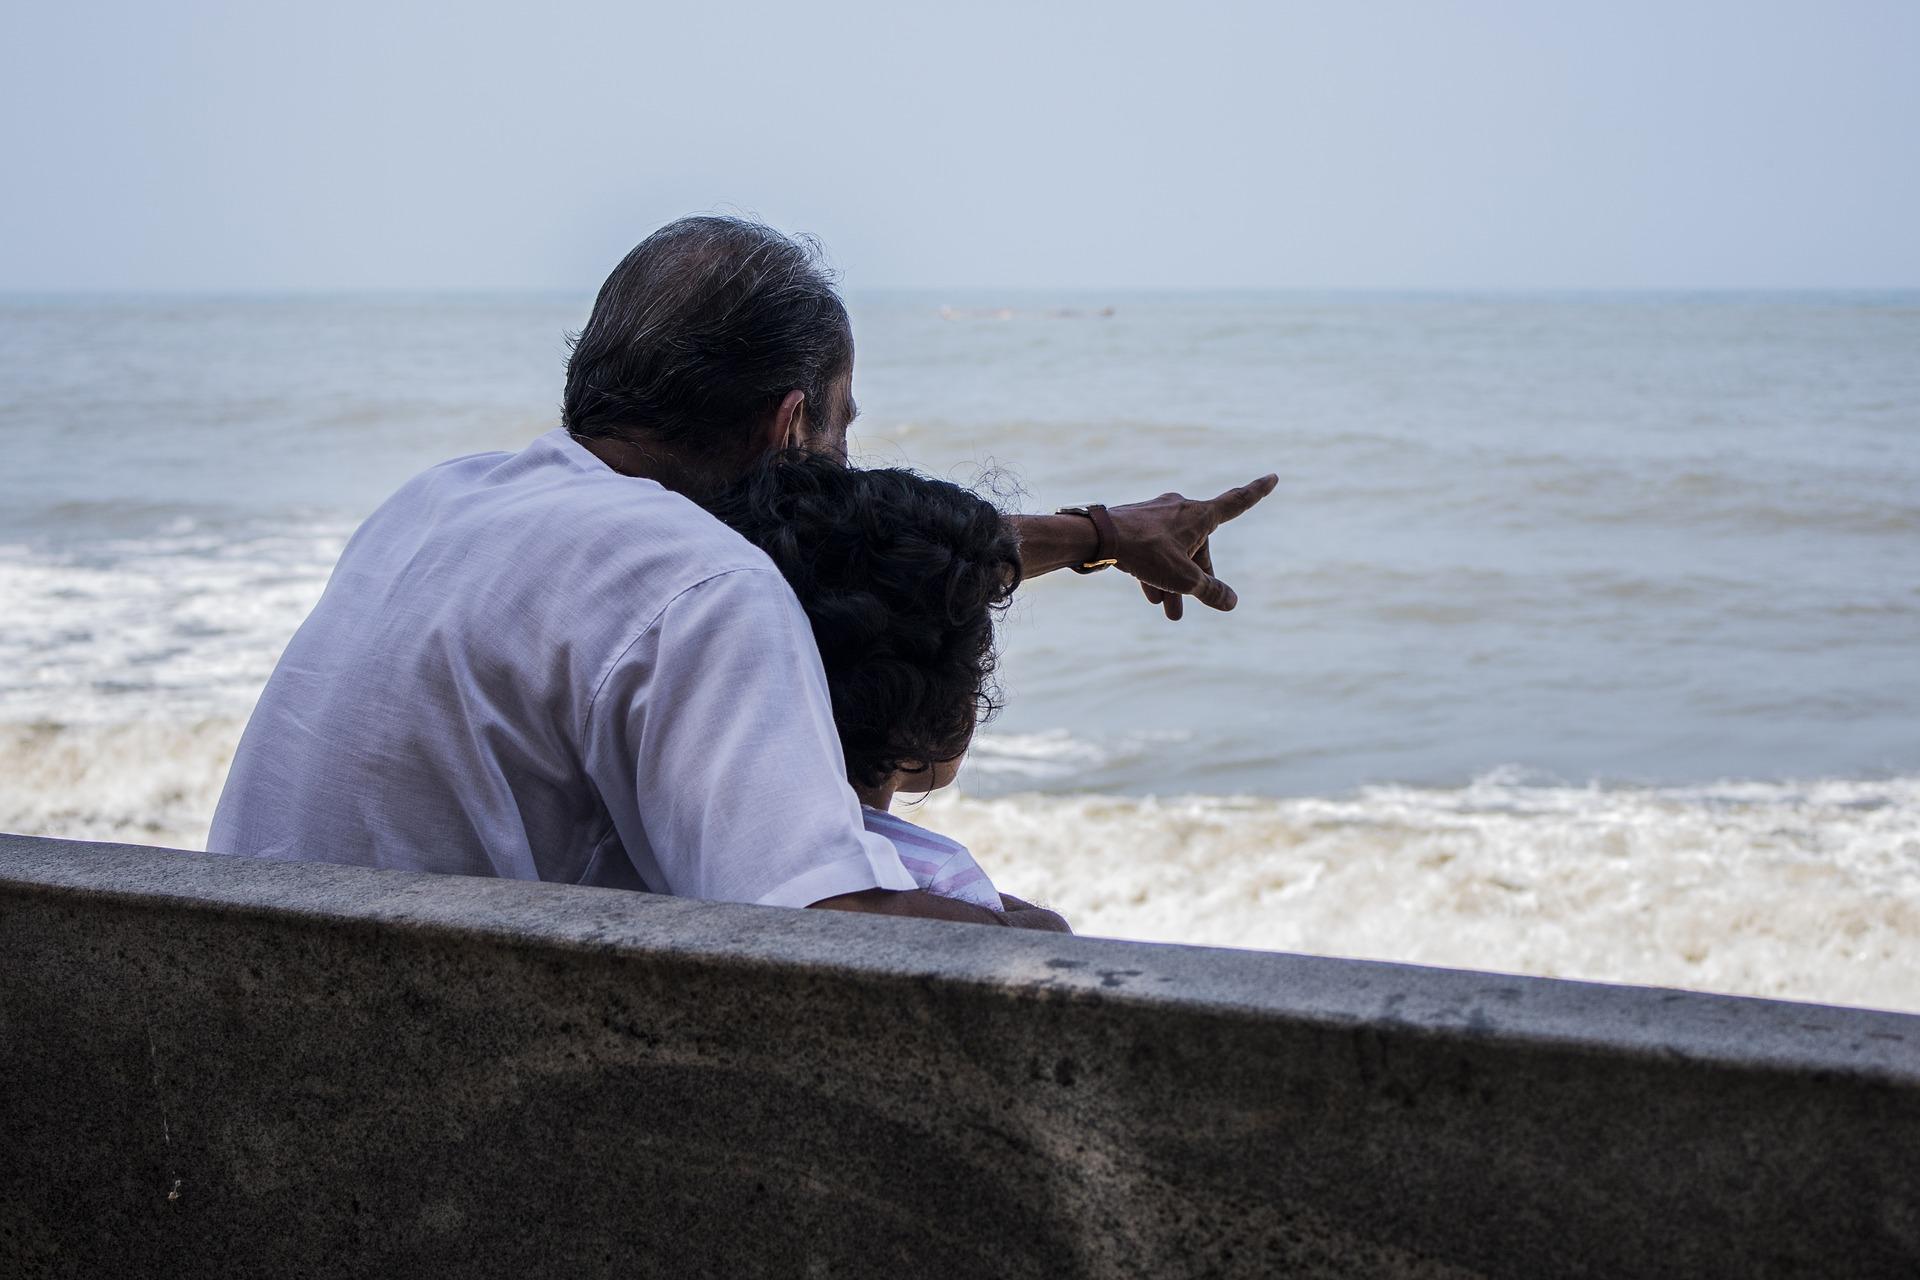 grandfather-with-grandchild-at-beach.jpg